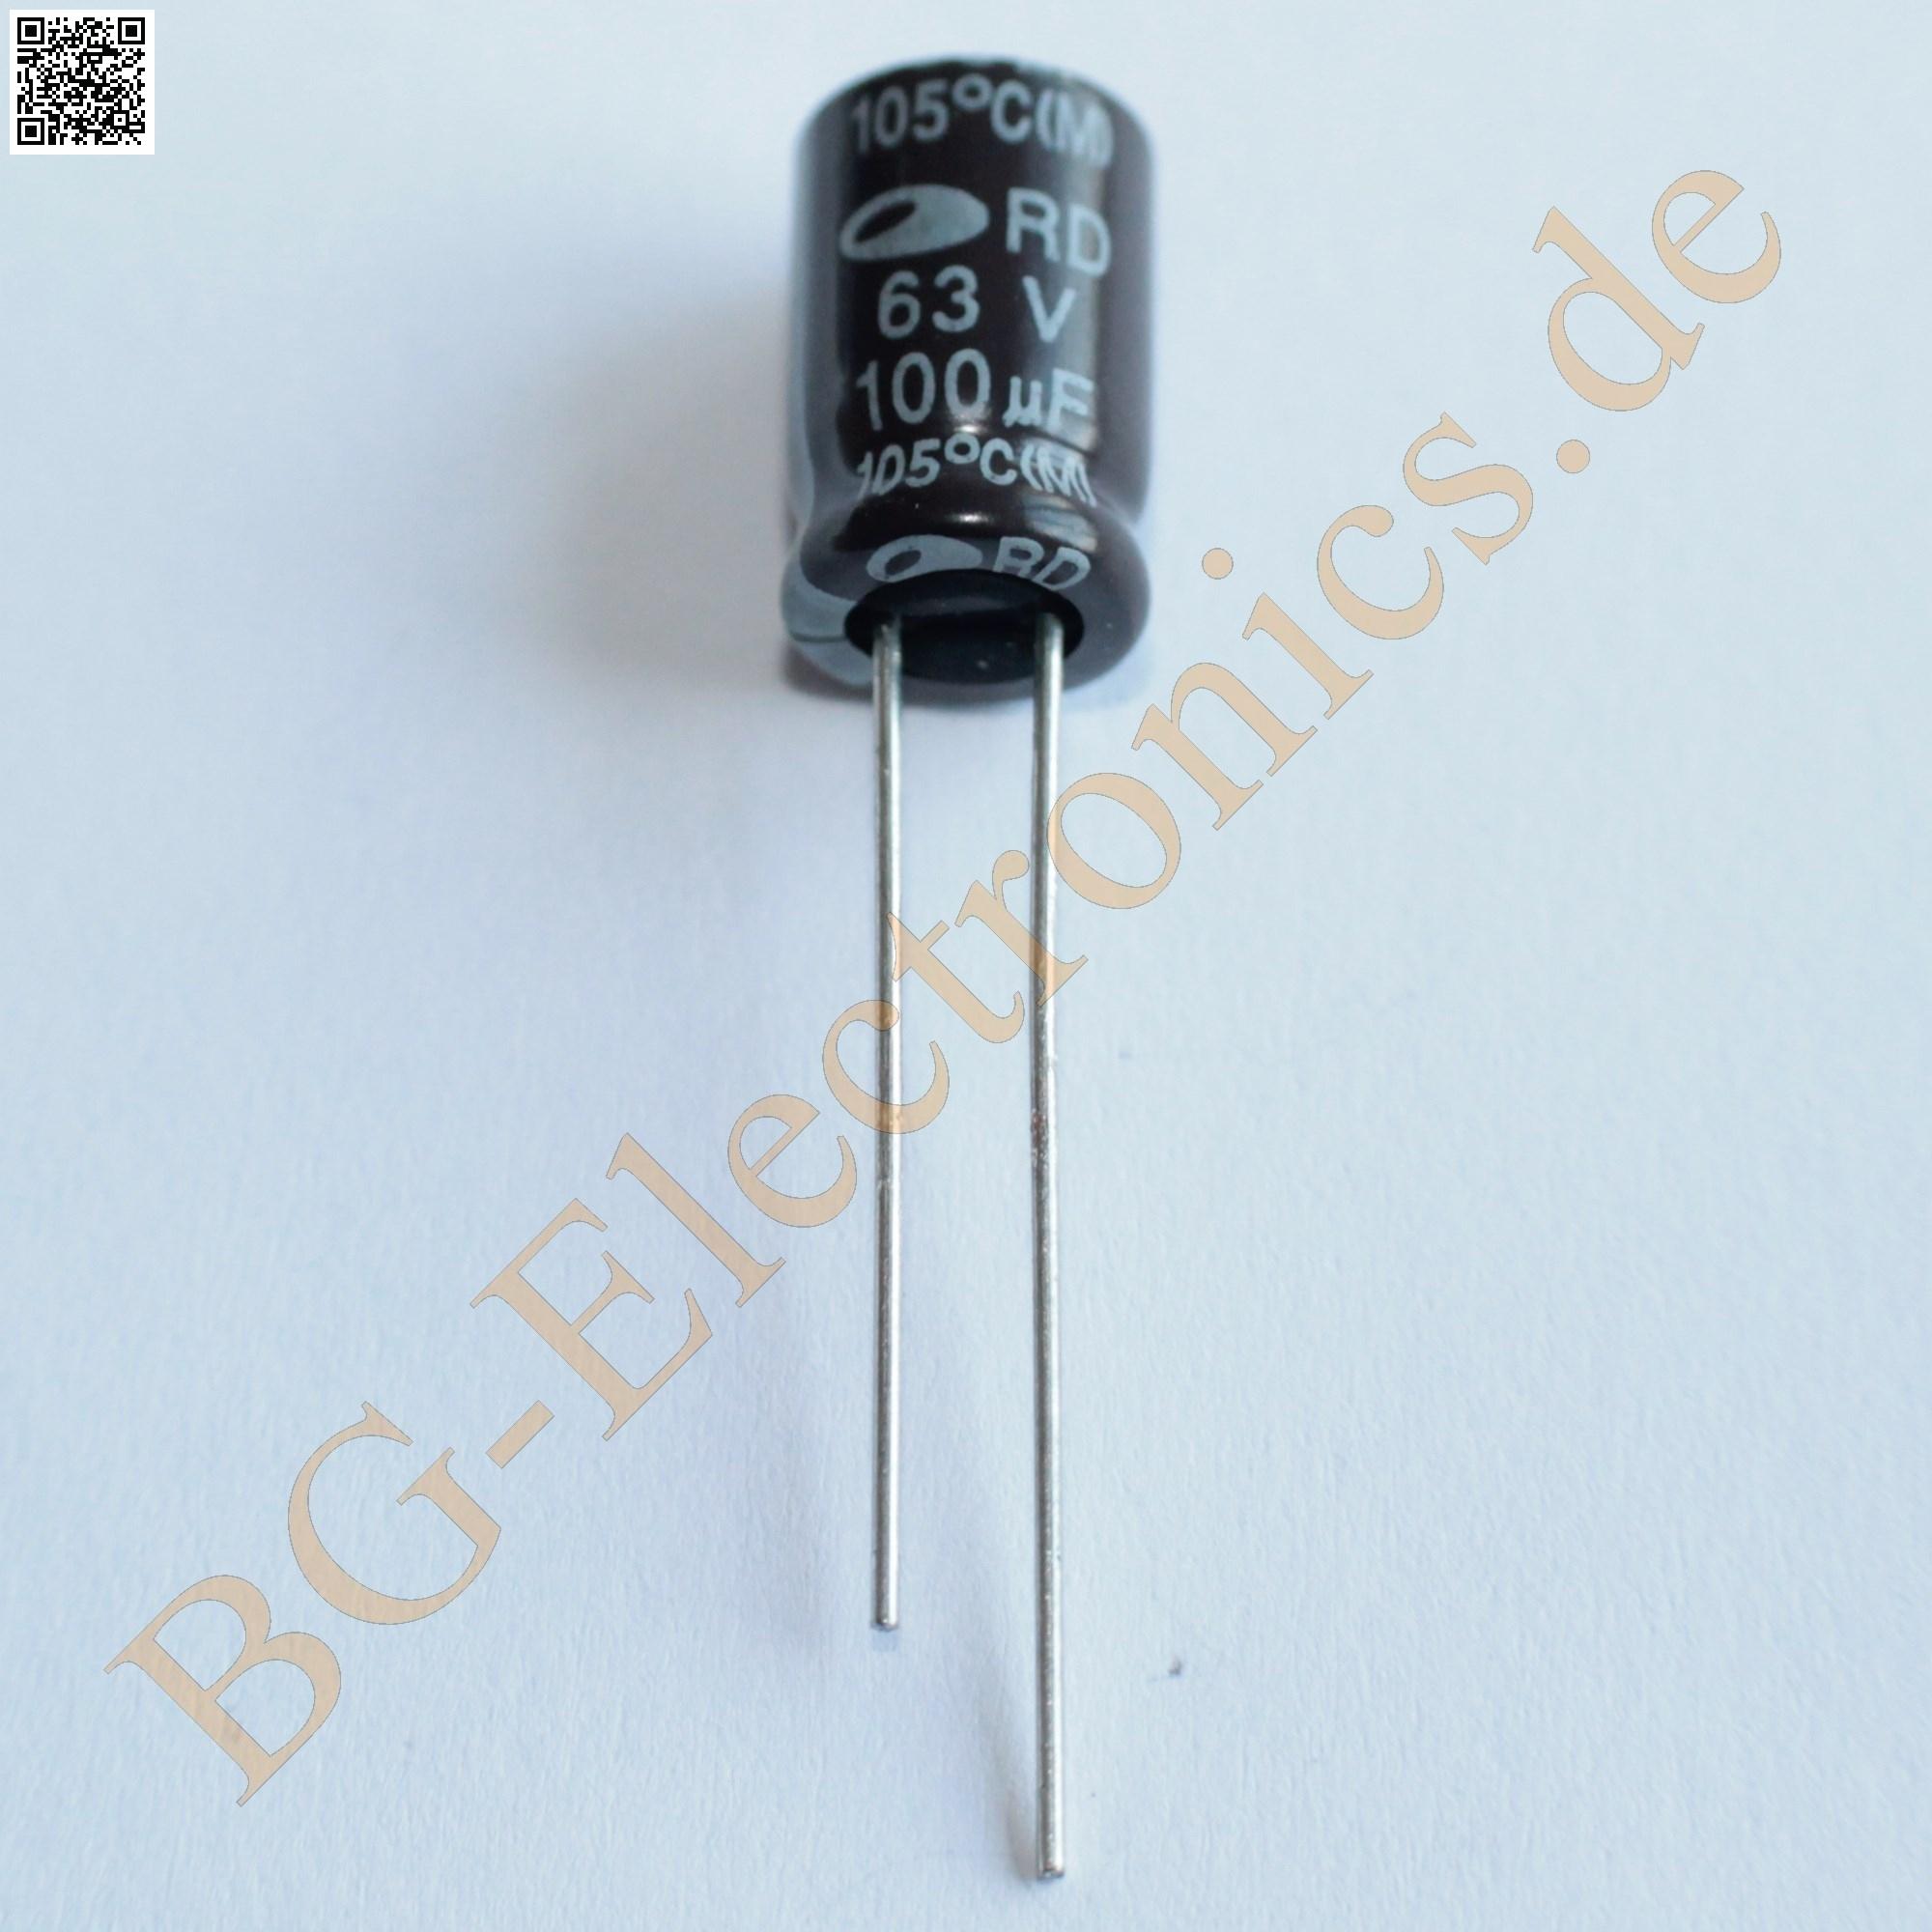 20 x 100 f 100uf 63v 105 rm3 5 elko kondensator capacitor samwha e cap 20pcs ebay. Black Bedroom Furniture Sets. Home Design Ideas